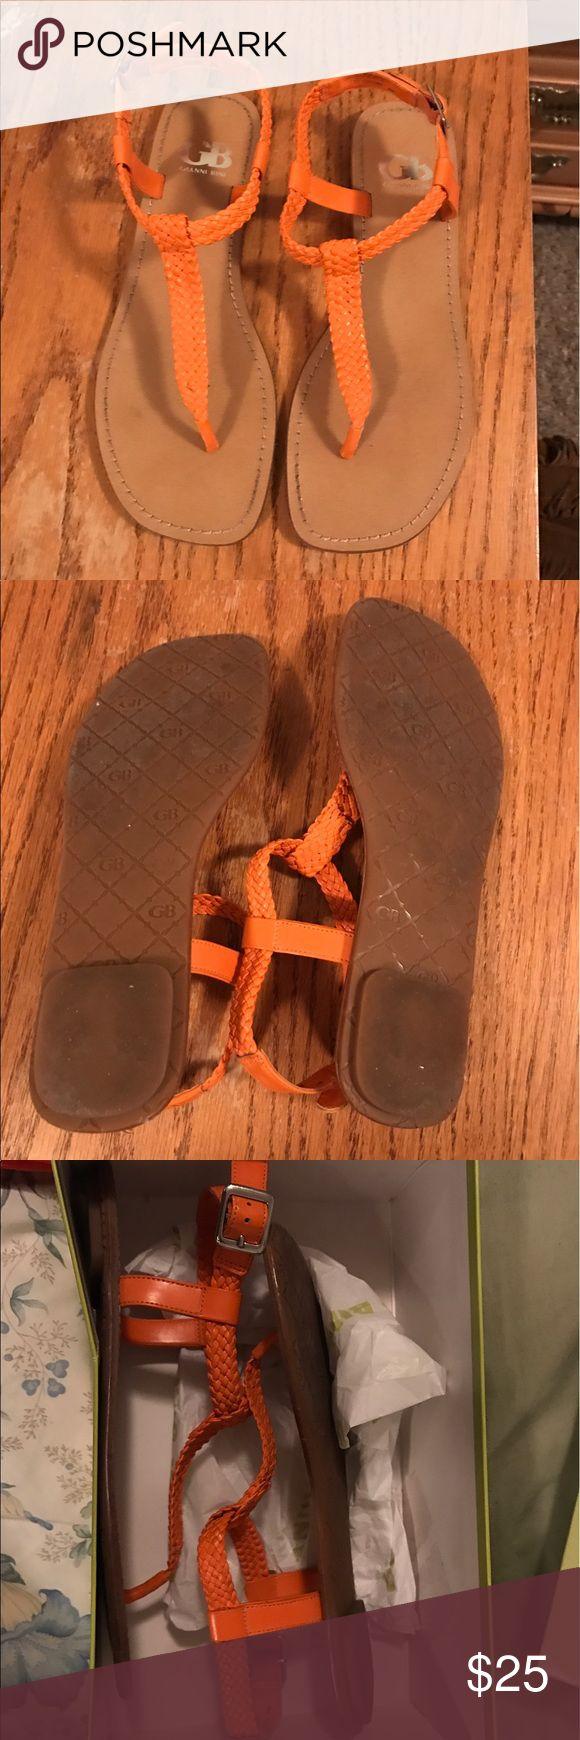 Gianni bini flats Worn once Gianni bini orange sandals Gianni Bini Shoes Sandals